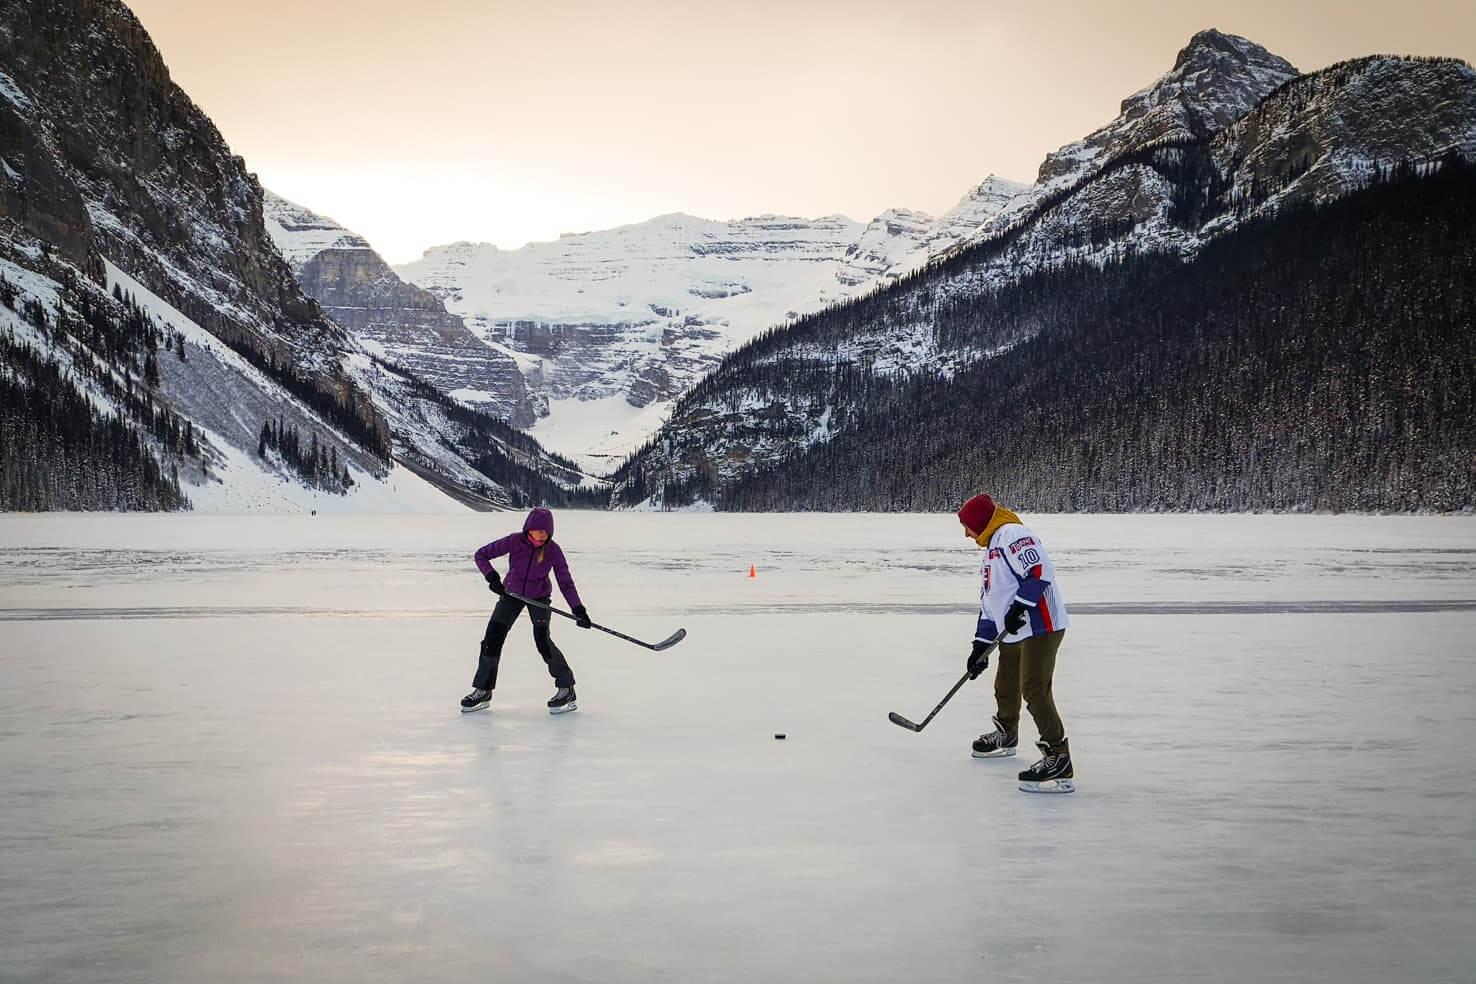 Ice skating in Banff National Park - Lake Louise